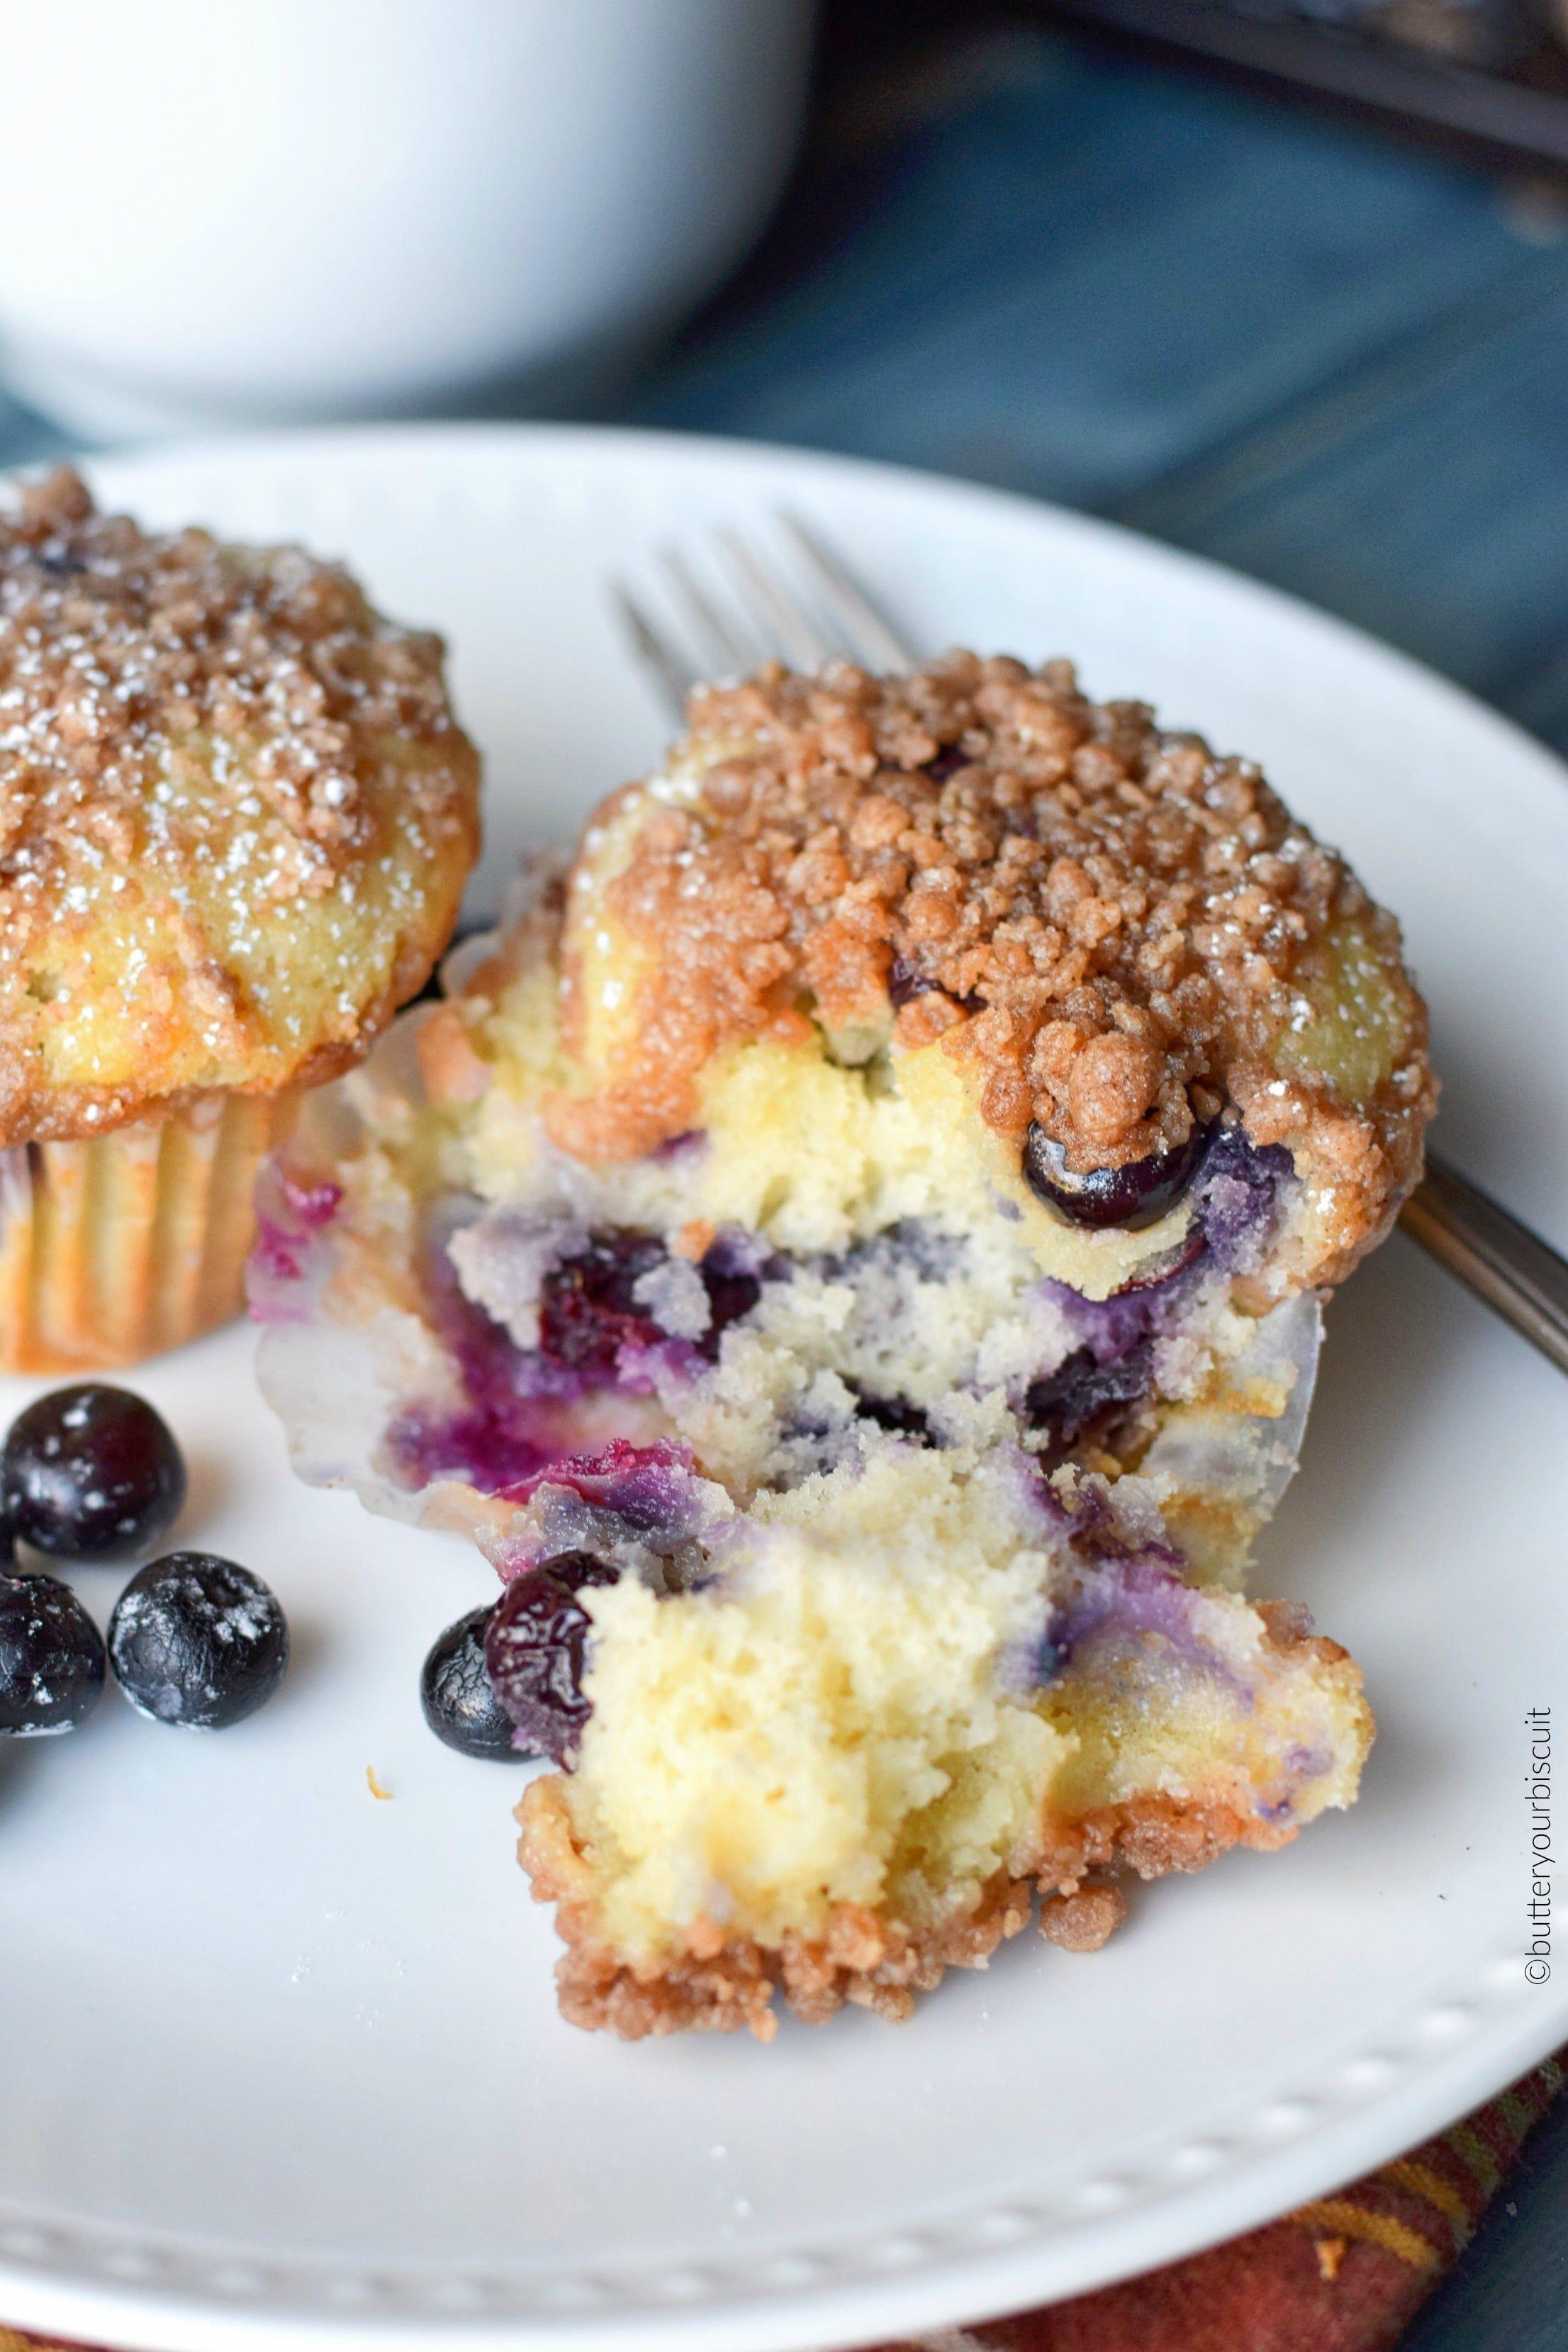 Sour Cream Blueberry Muffins Recipe Blue Berry Muffins Sour Cream Muffins Huckleberry Recipes